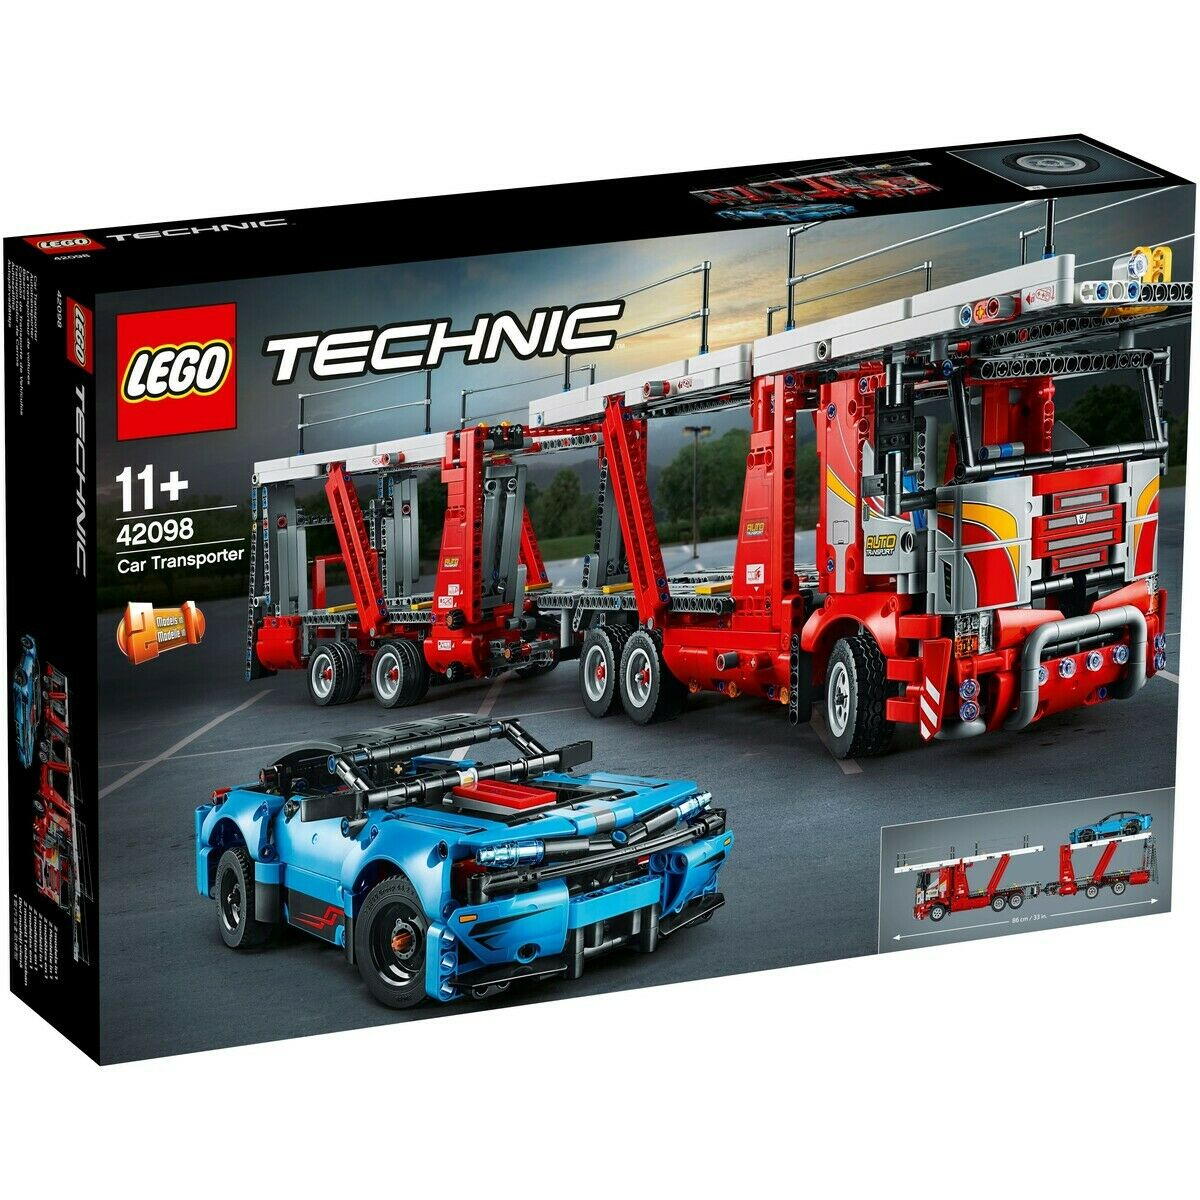 LEGO Technic 42098 - Car Transporter - New sealed - International